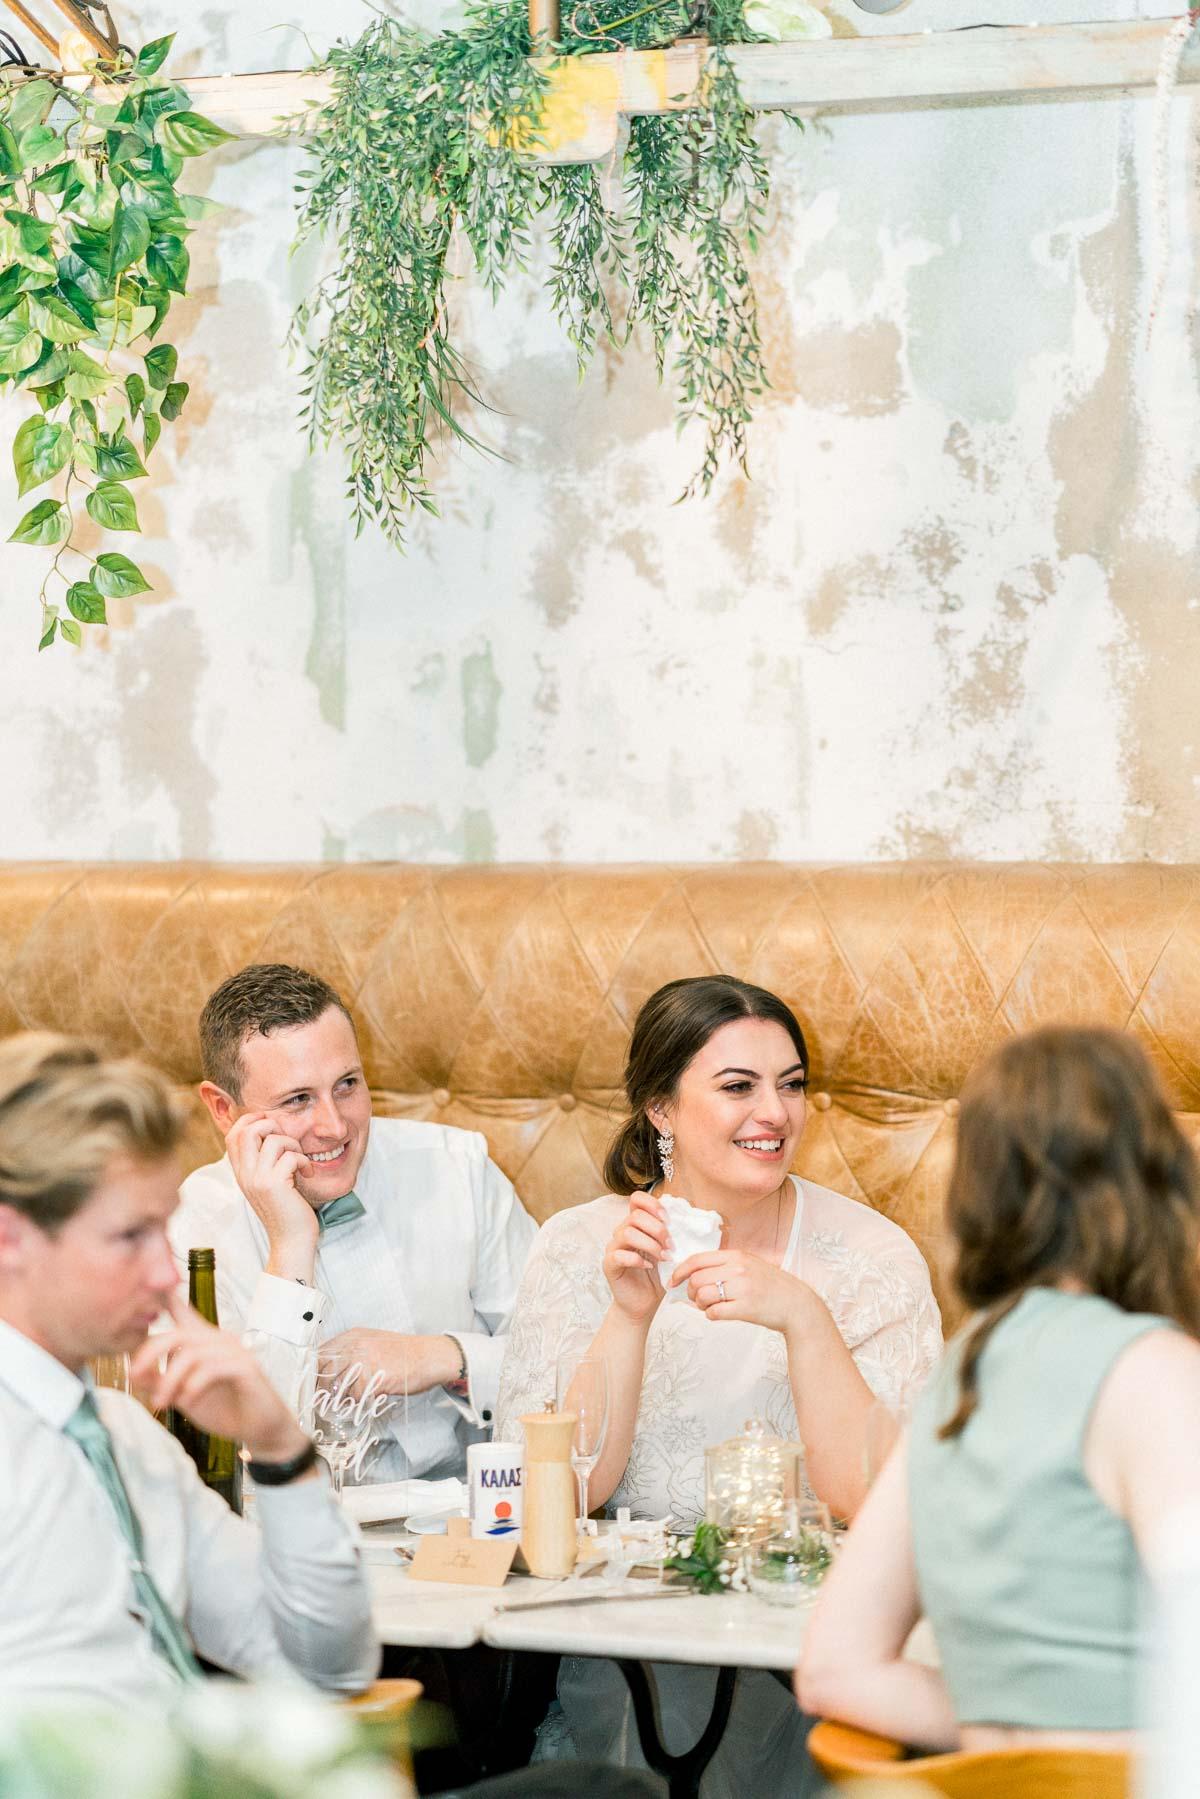 little-henri-cafe-wedding-thornbury-heart+soul-weddings-jane-aaron-06096.jpg